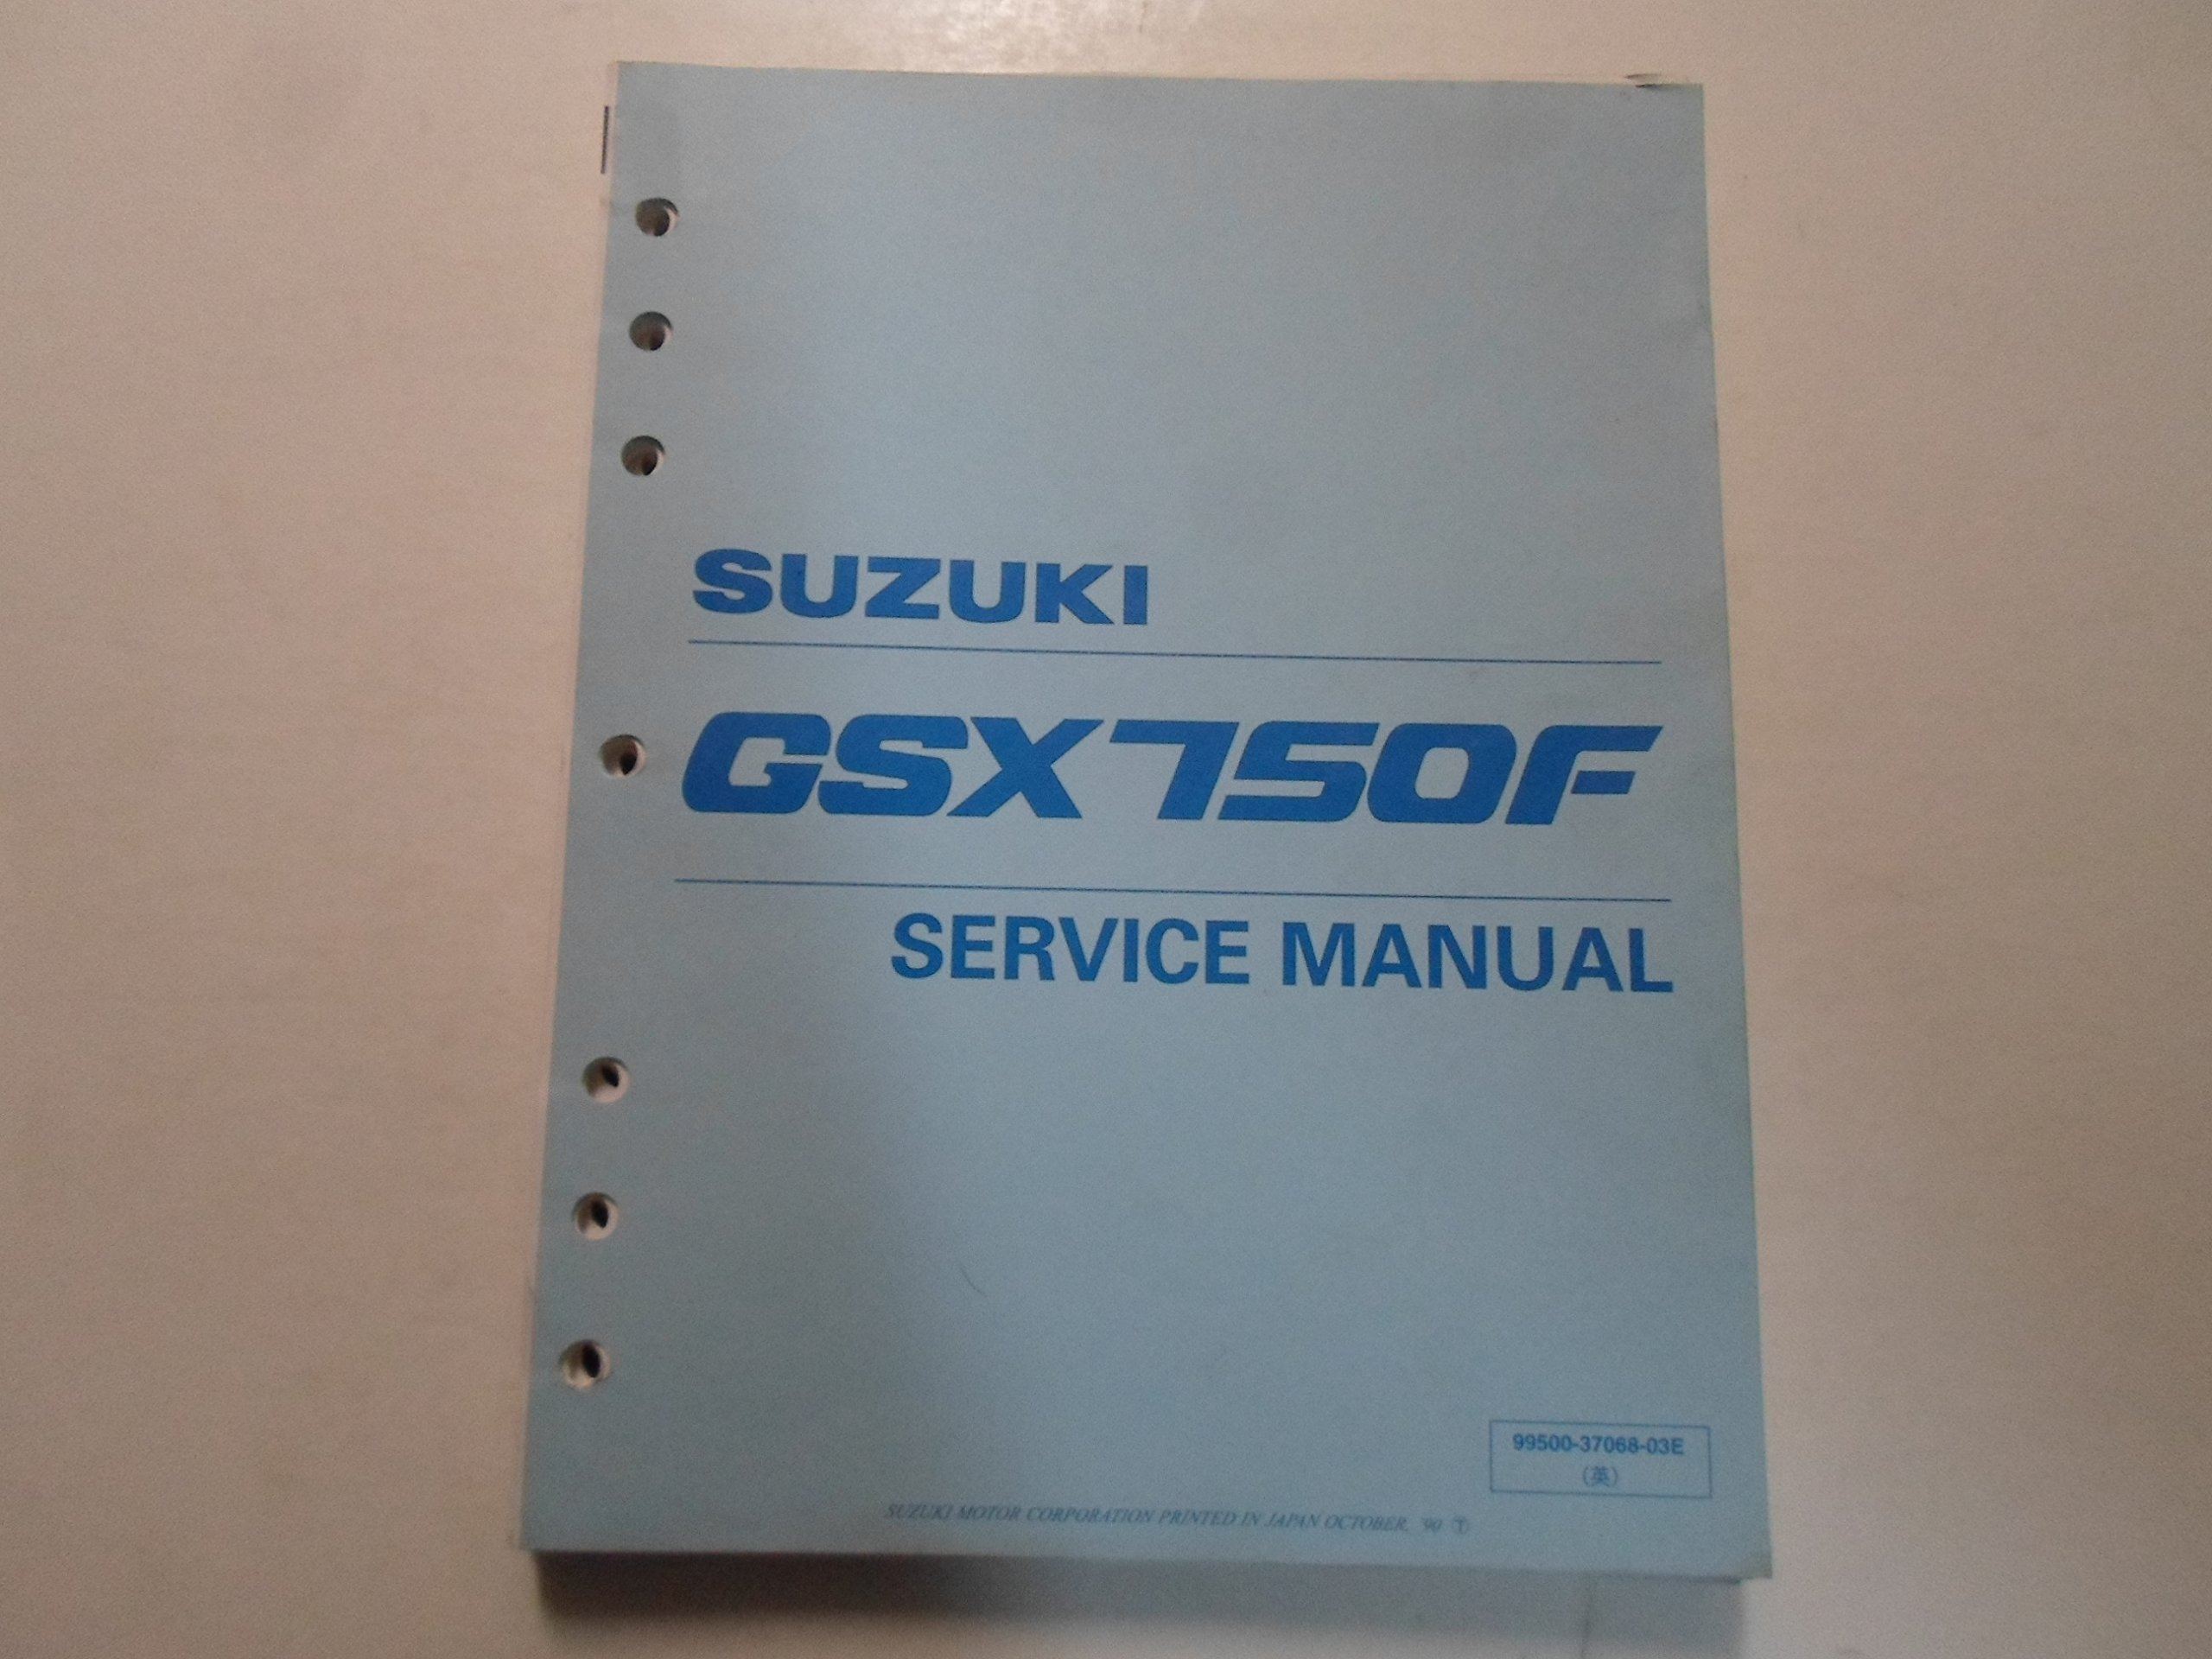 1990 suzuki gsx750f service repair shop manual loose leaf suzuki rh amazon com suzuki gsxf 750 service manual suzuki gsx750f service manual free download